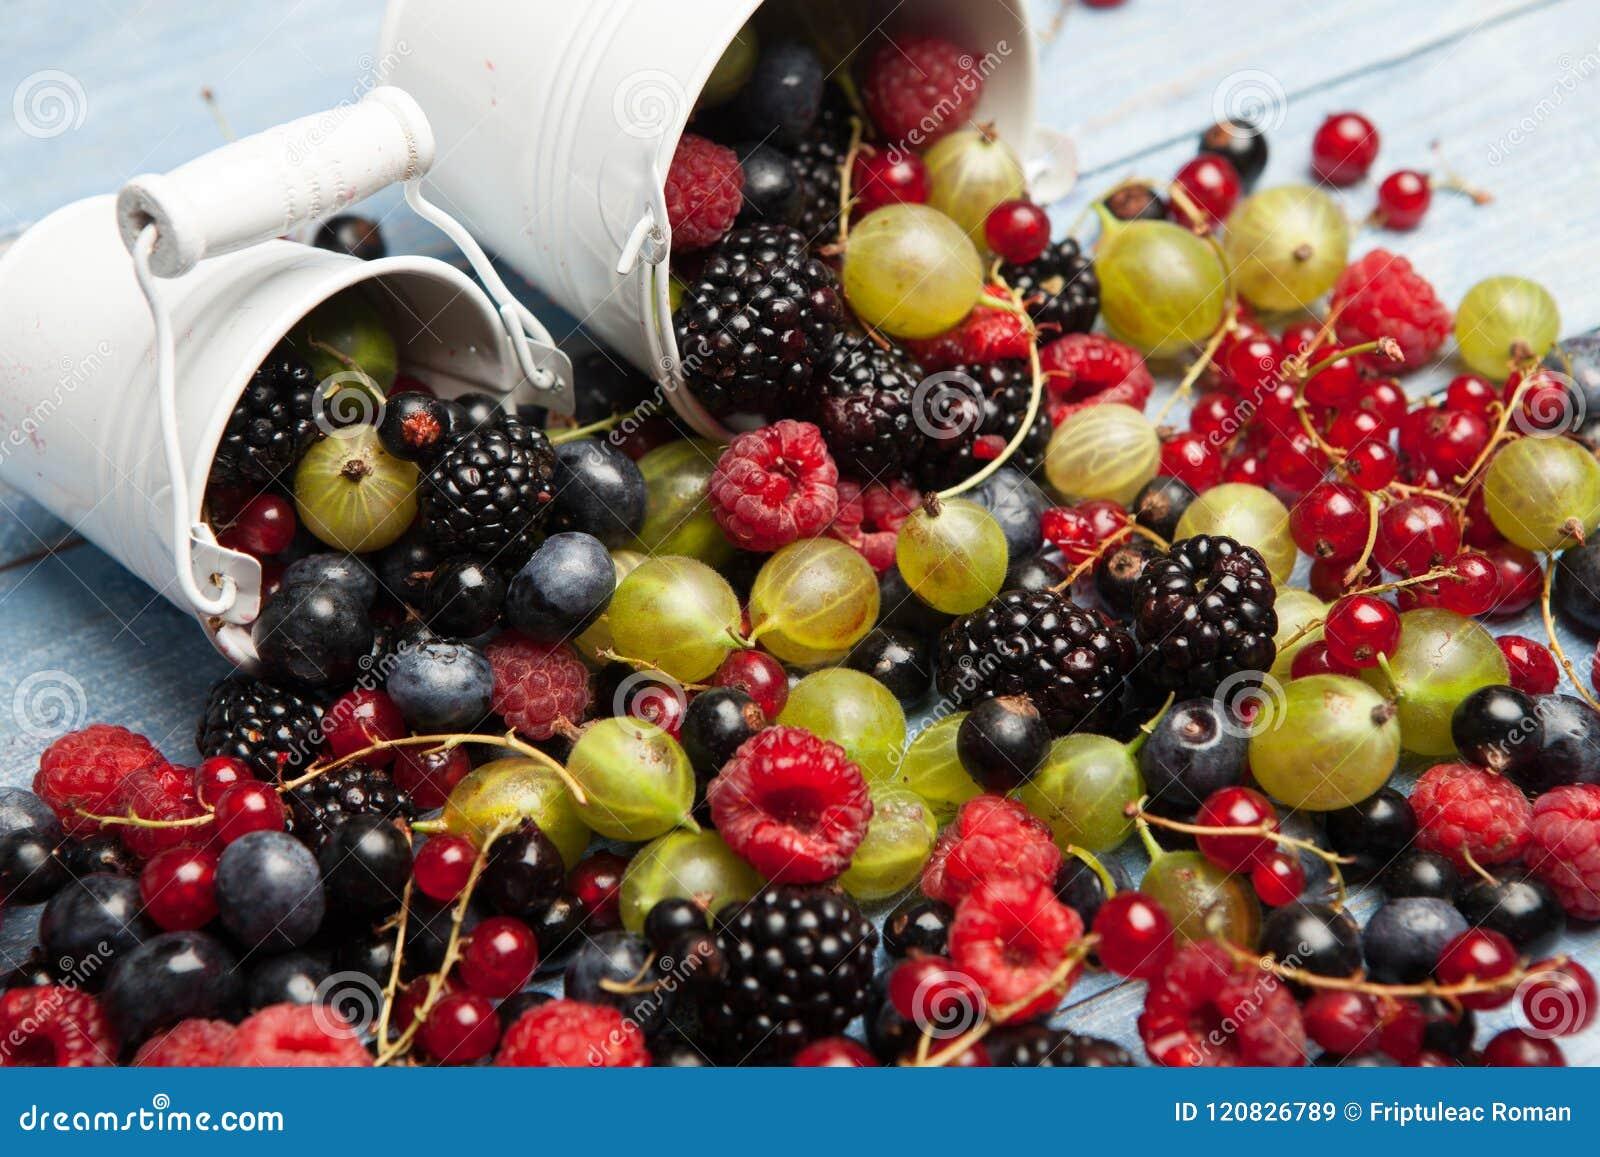 Berry detox diet